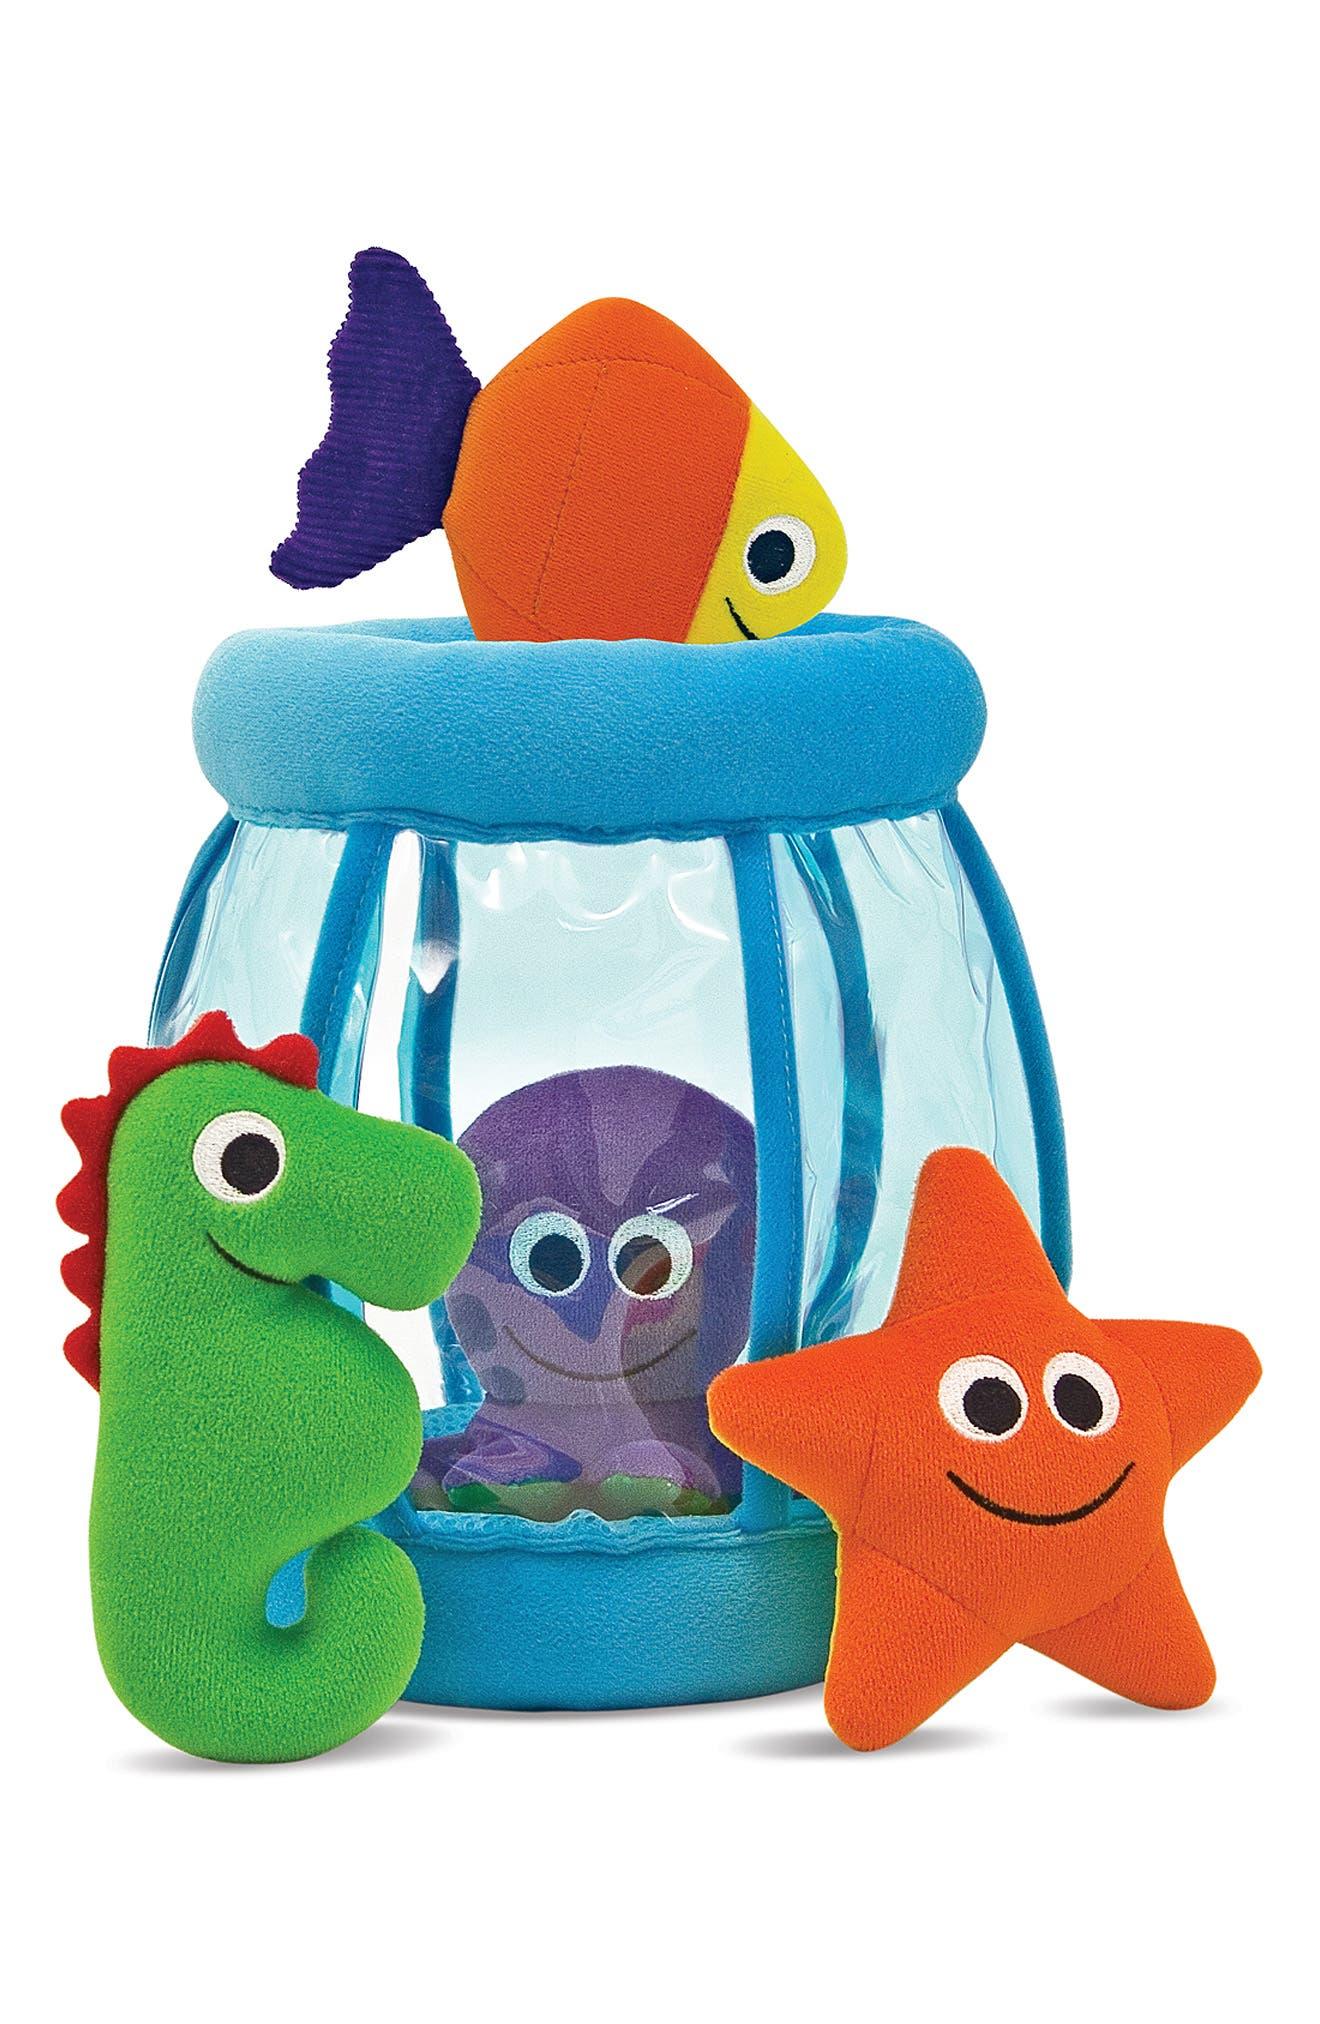 'Fishbowl Fill & Spill' Game,                             Alternate thumbnail 3, color,                             MULTI